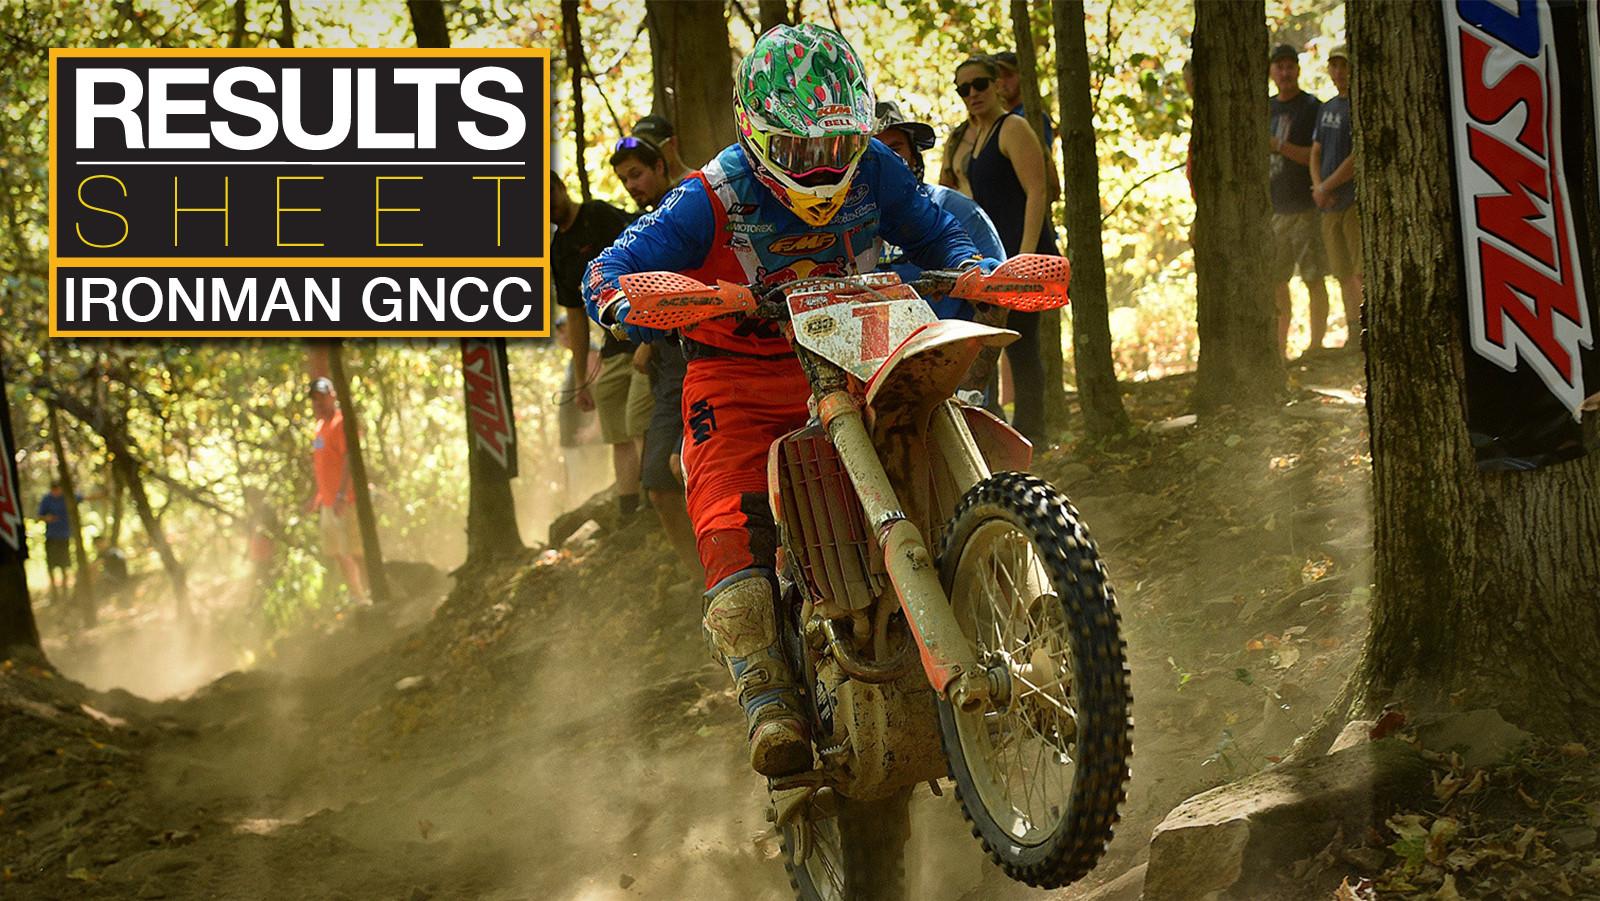 Results Sheet: Ironman GNCC